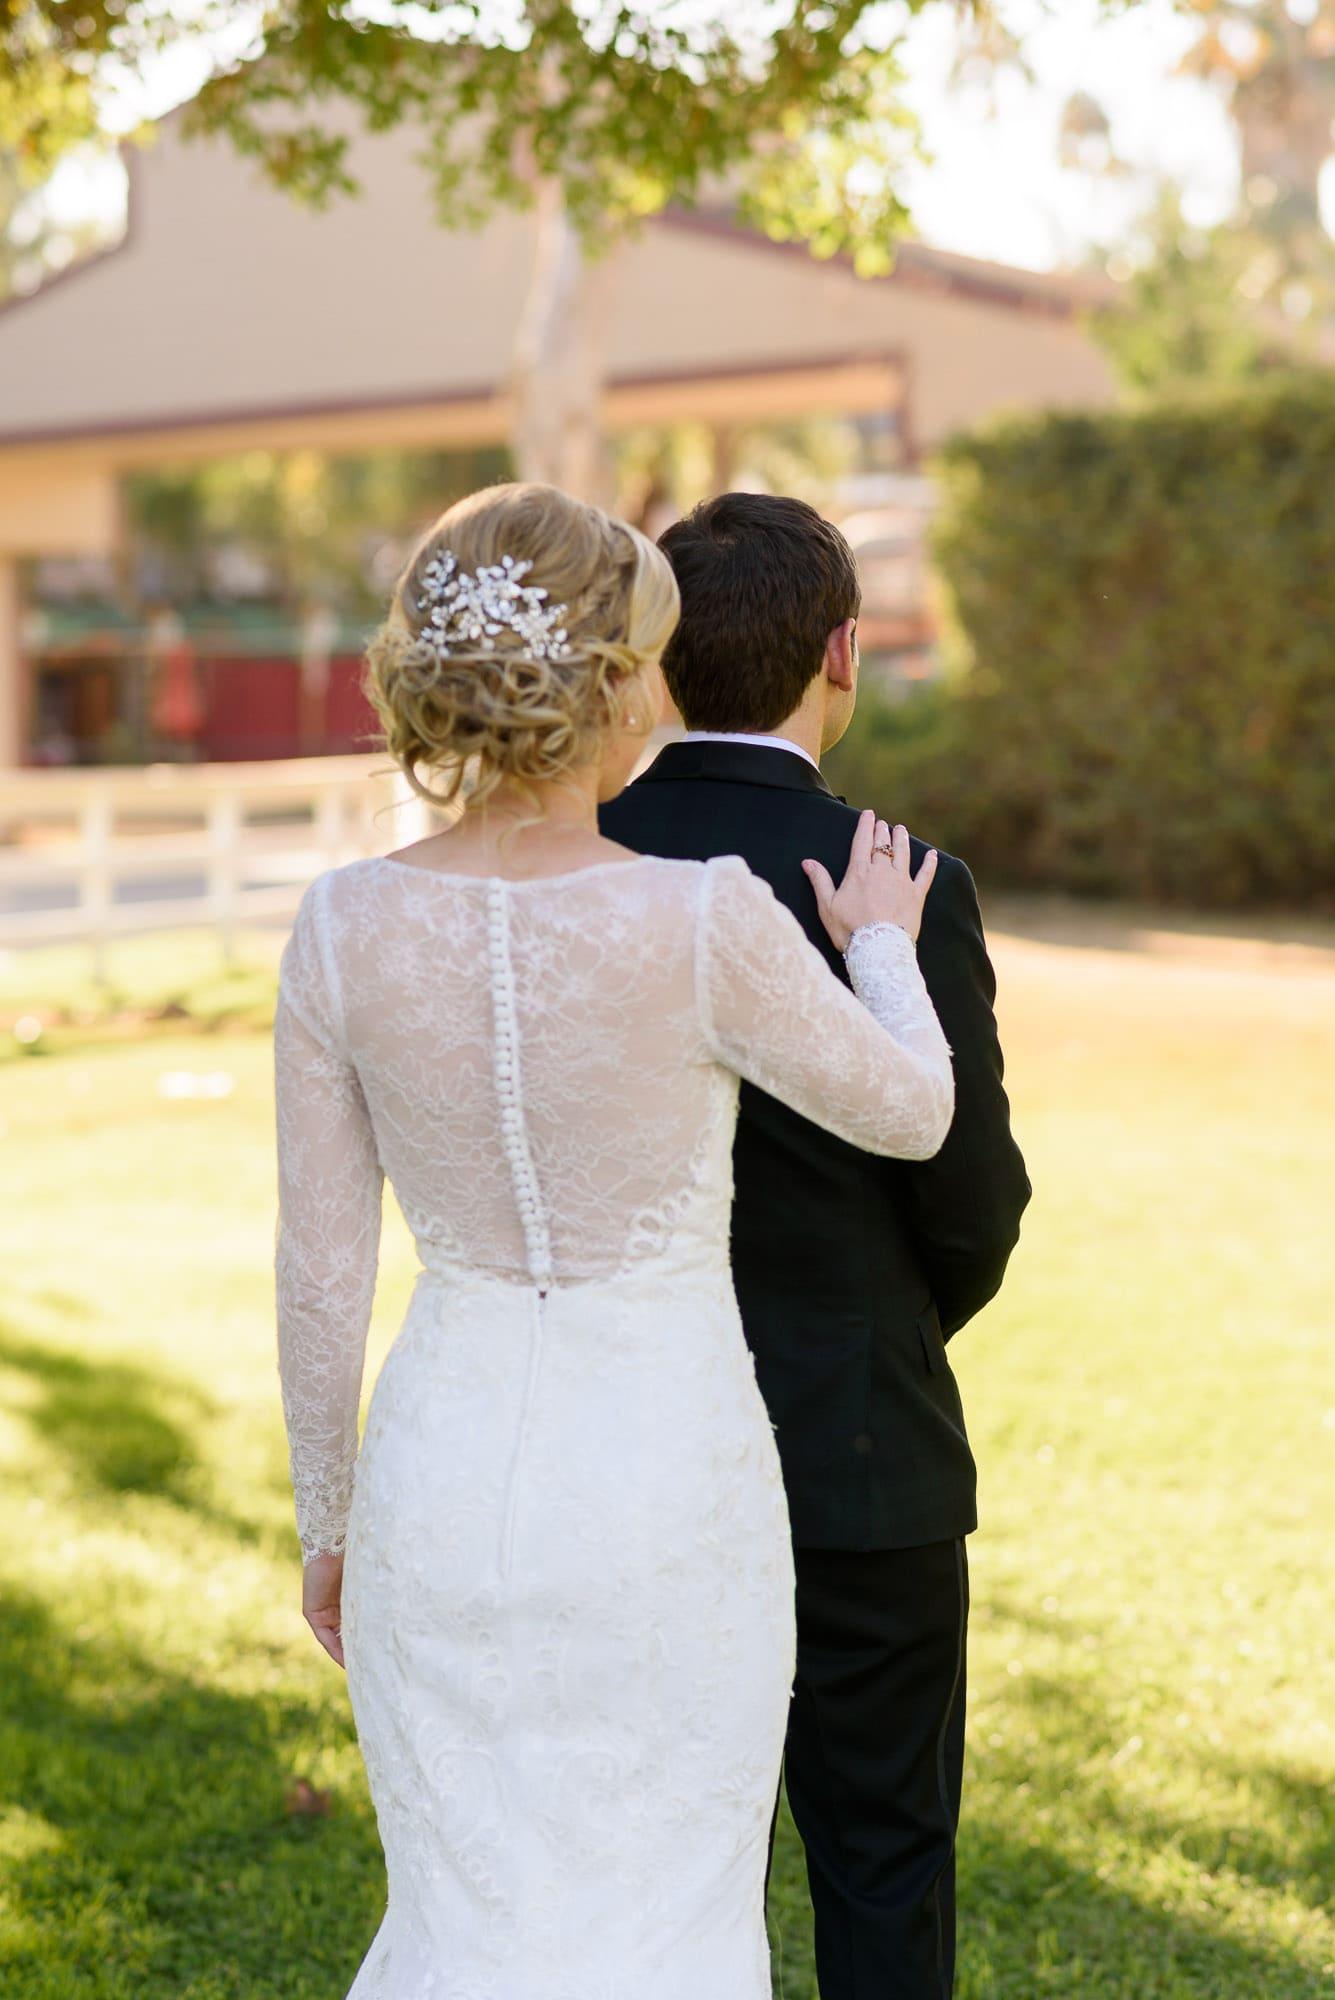 019_Alan_and_Heidi_Los_Angeles_Equestrian_Center_Wedding